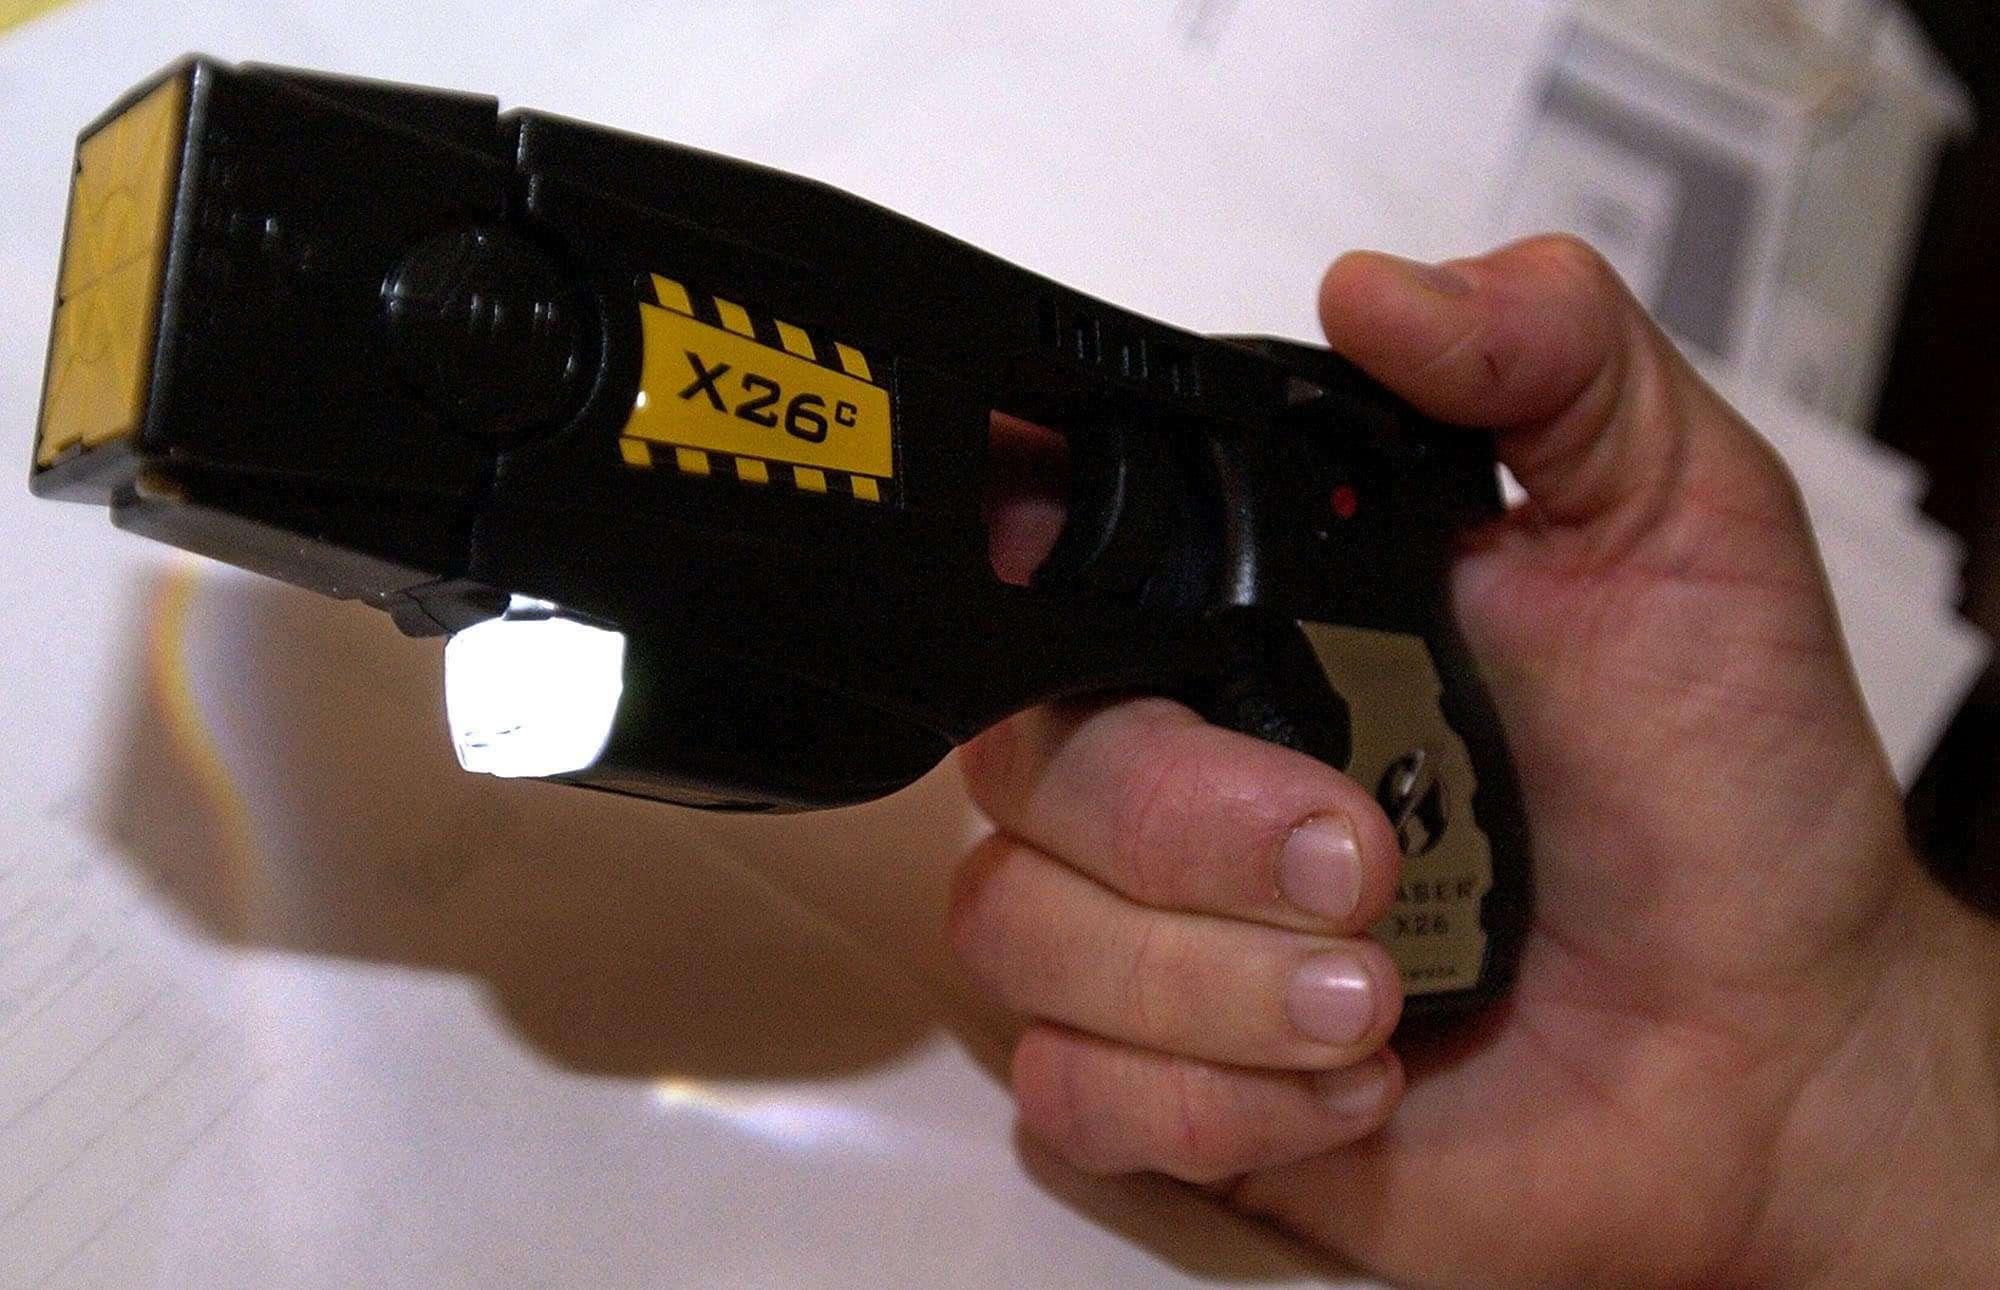 Steve Tuttle, director of communications for Taser International, Inc., holds the X26c stun gun Wednesday, Nov. 24, 2004, at the company's headquarters in Scottsdale, Ariz. (Tom Hood/Associated Press)